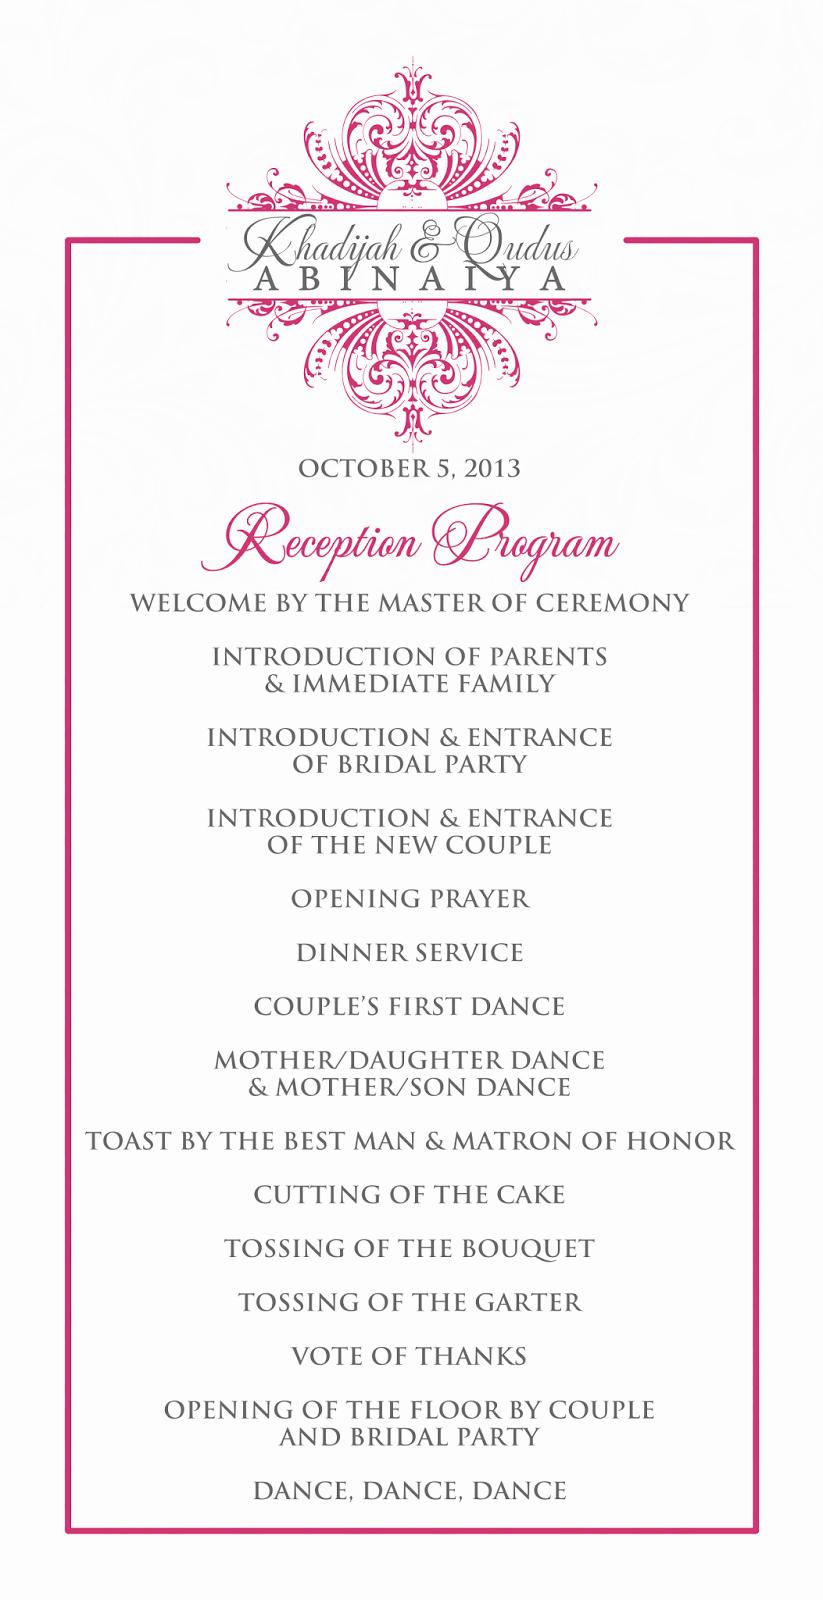 Wedding Reception Programme Template Best Of Wedding Reception Program Outline Agenda